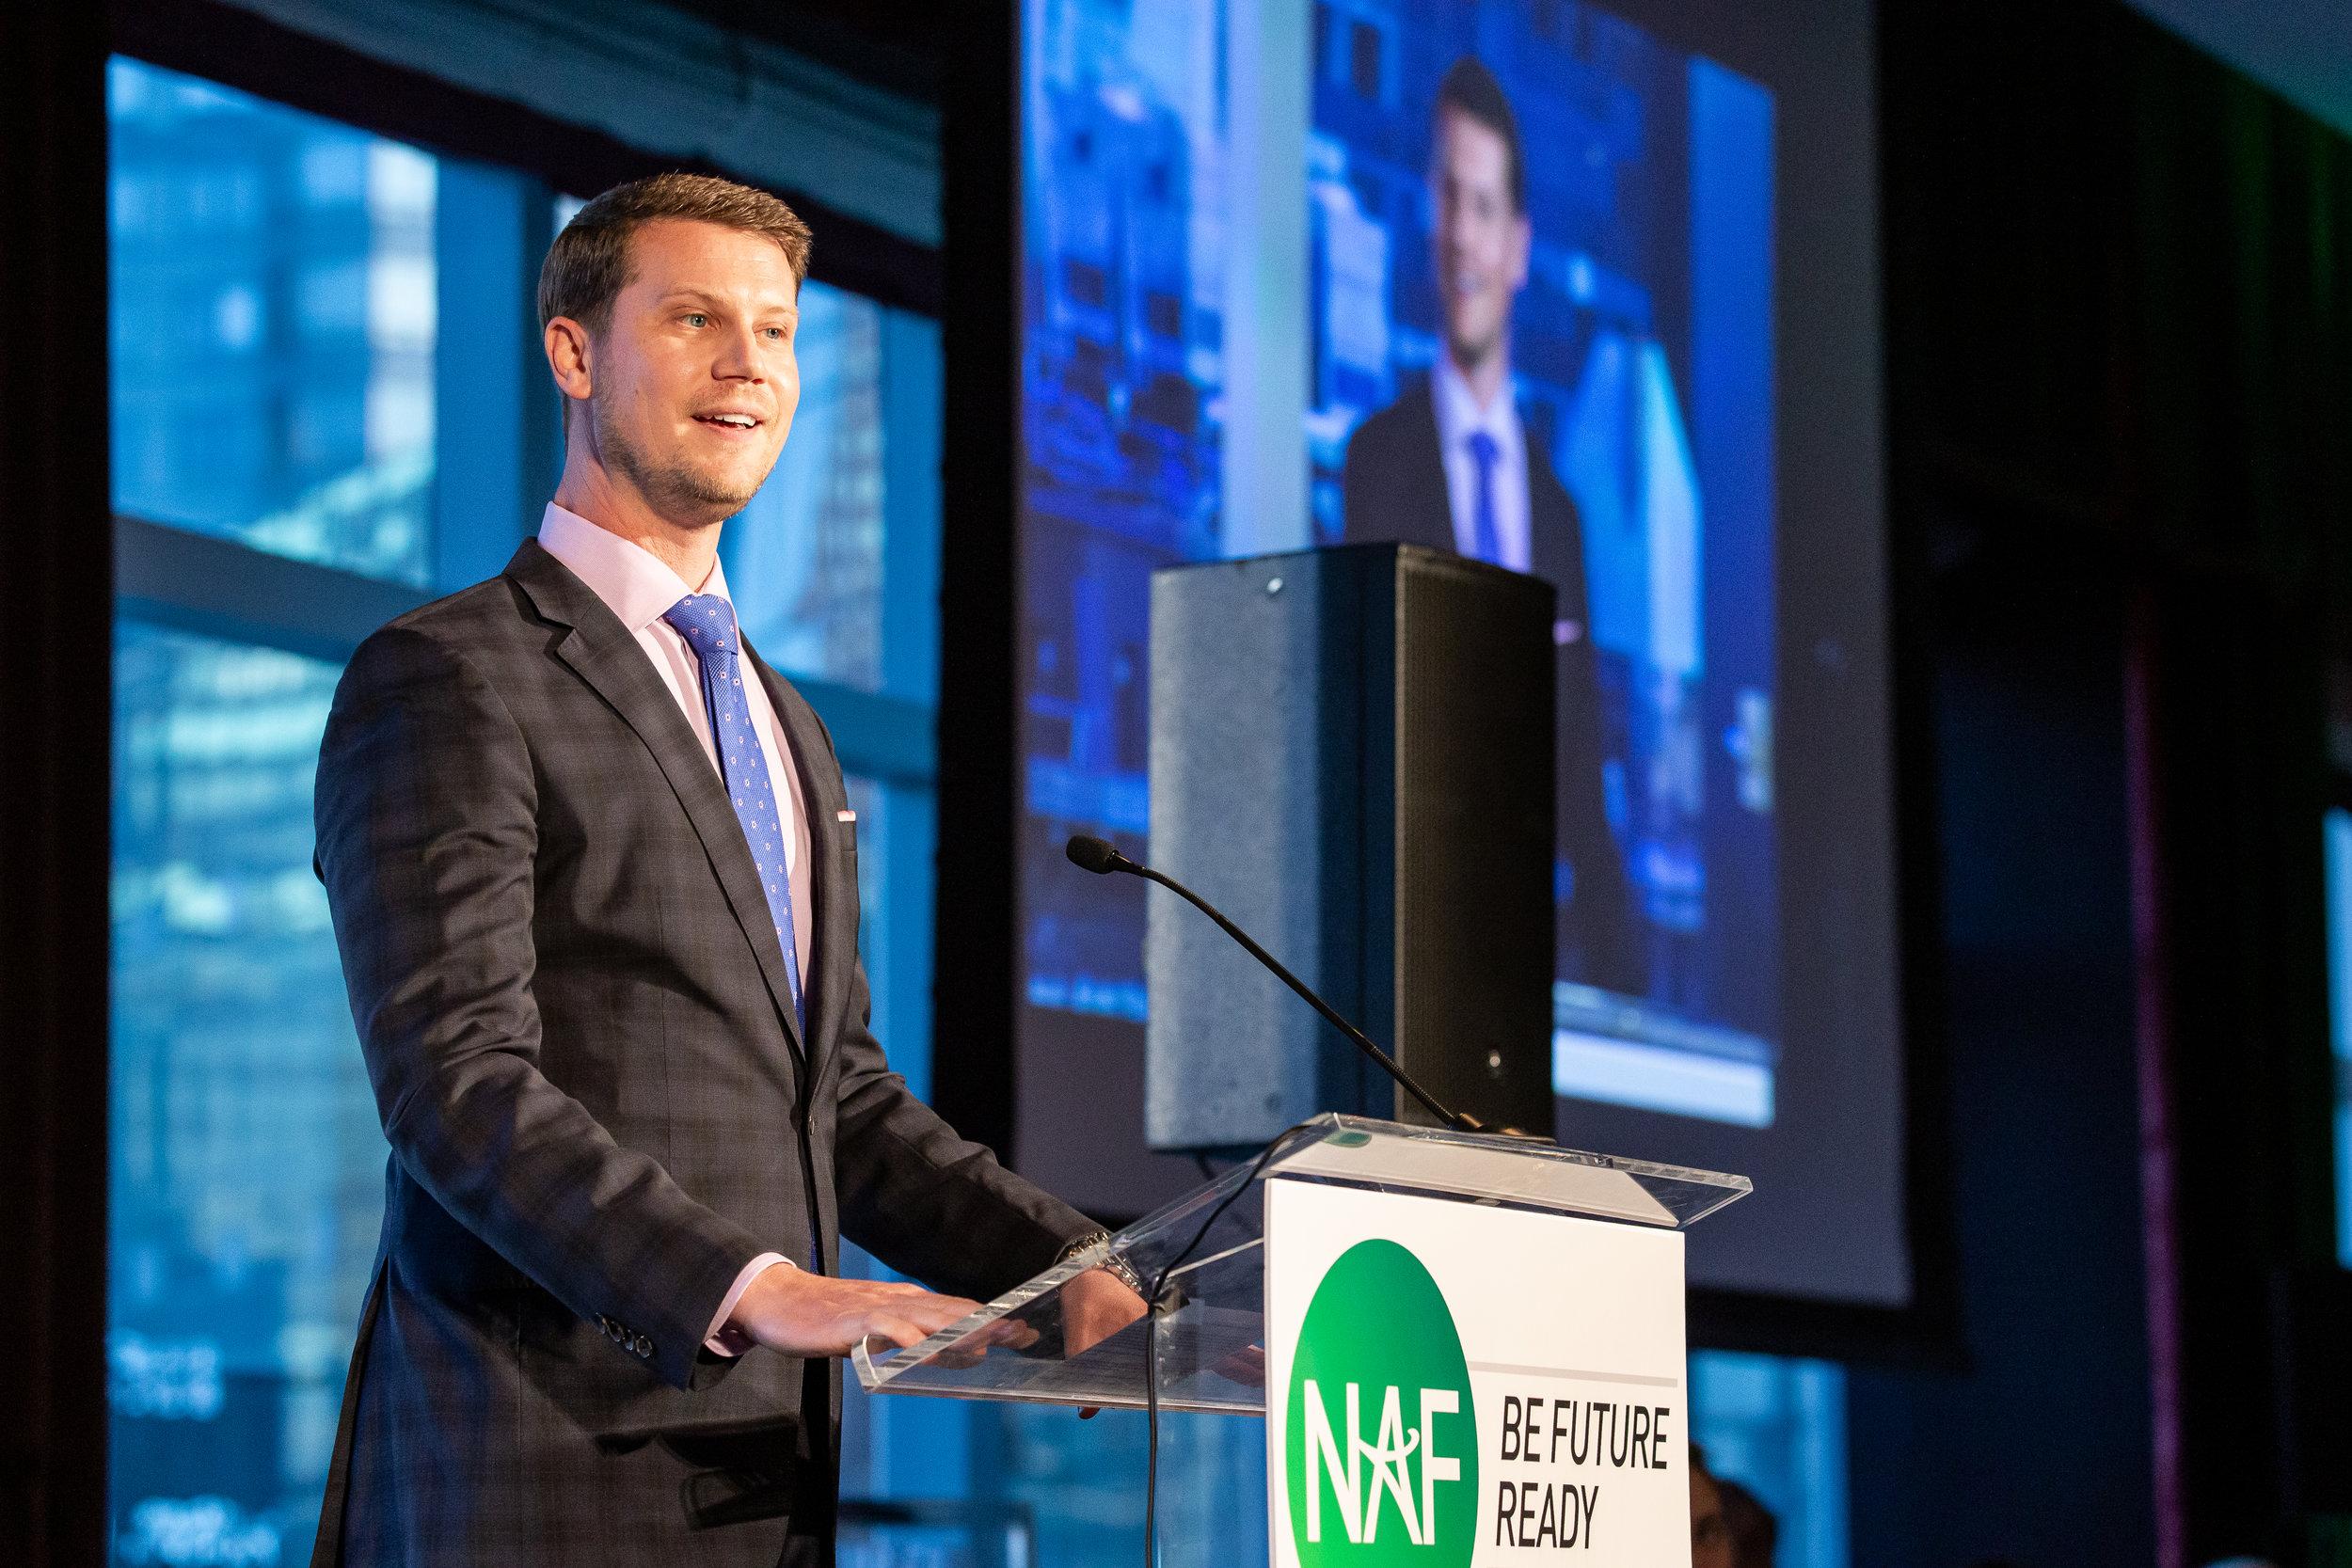 President of Lenovo North America Intelligent Devices Group, Matt Zielinski's